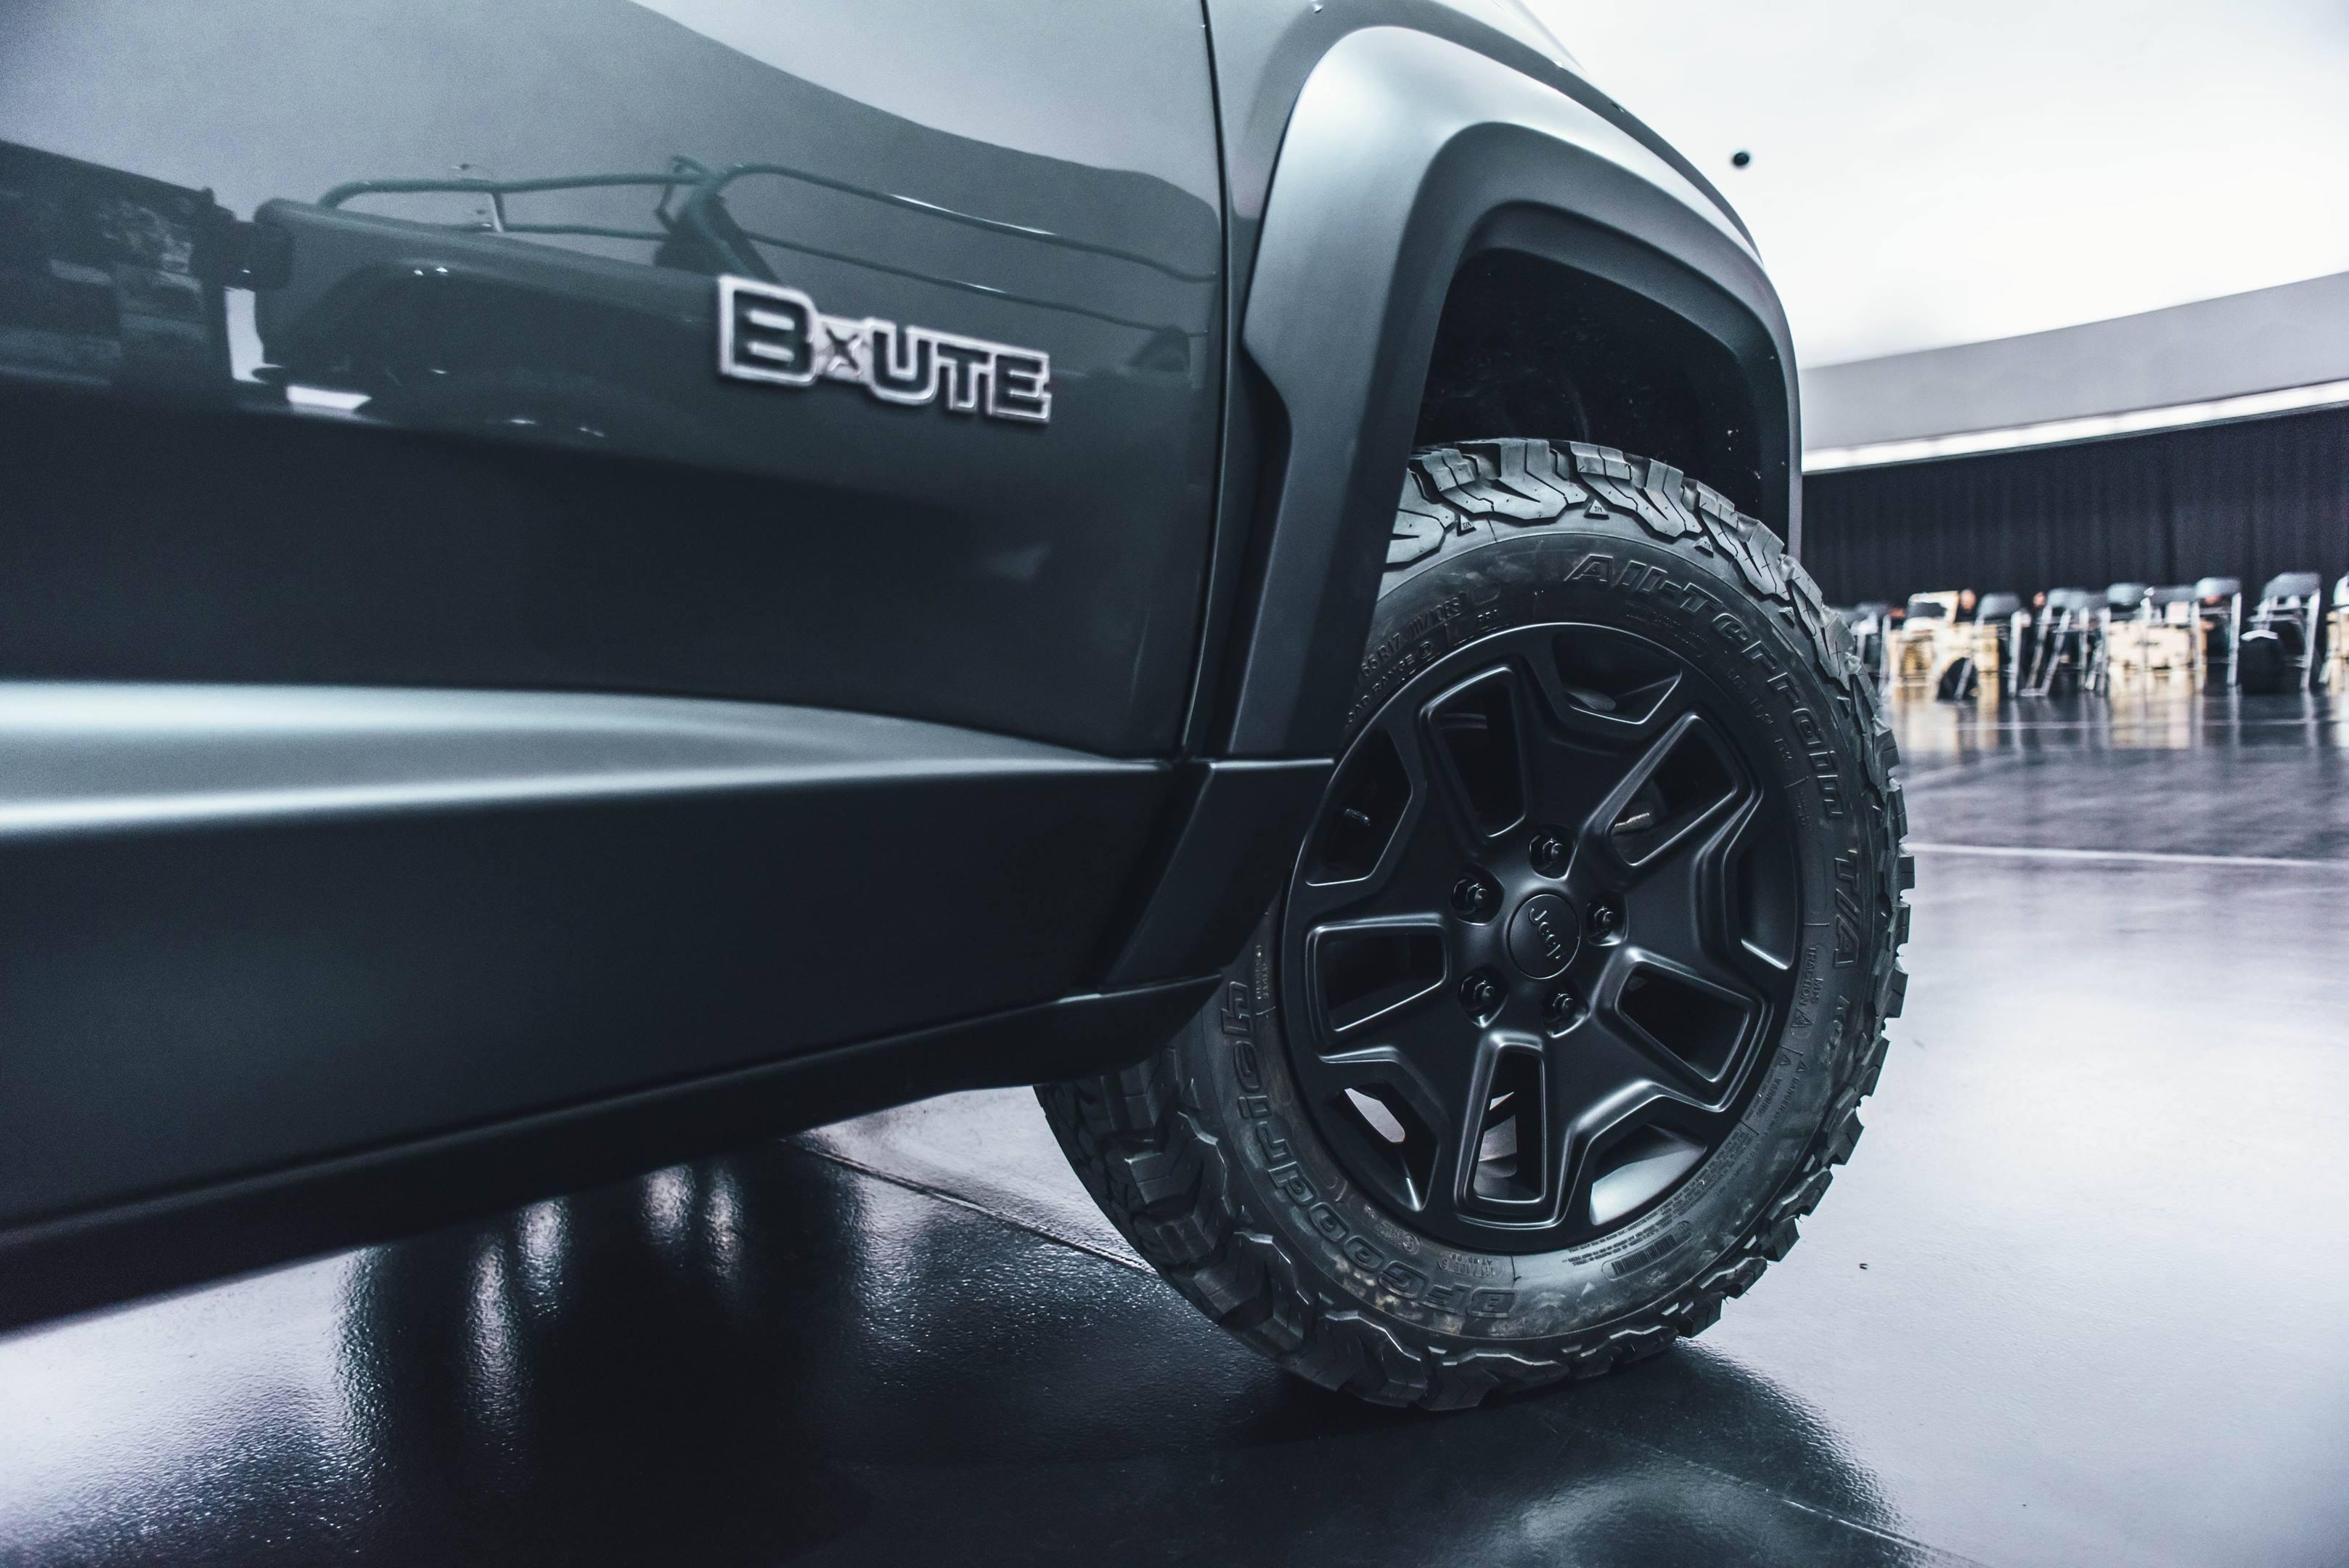 2018 Jeep B-Ute Concept wheel detail